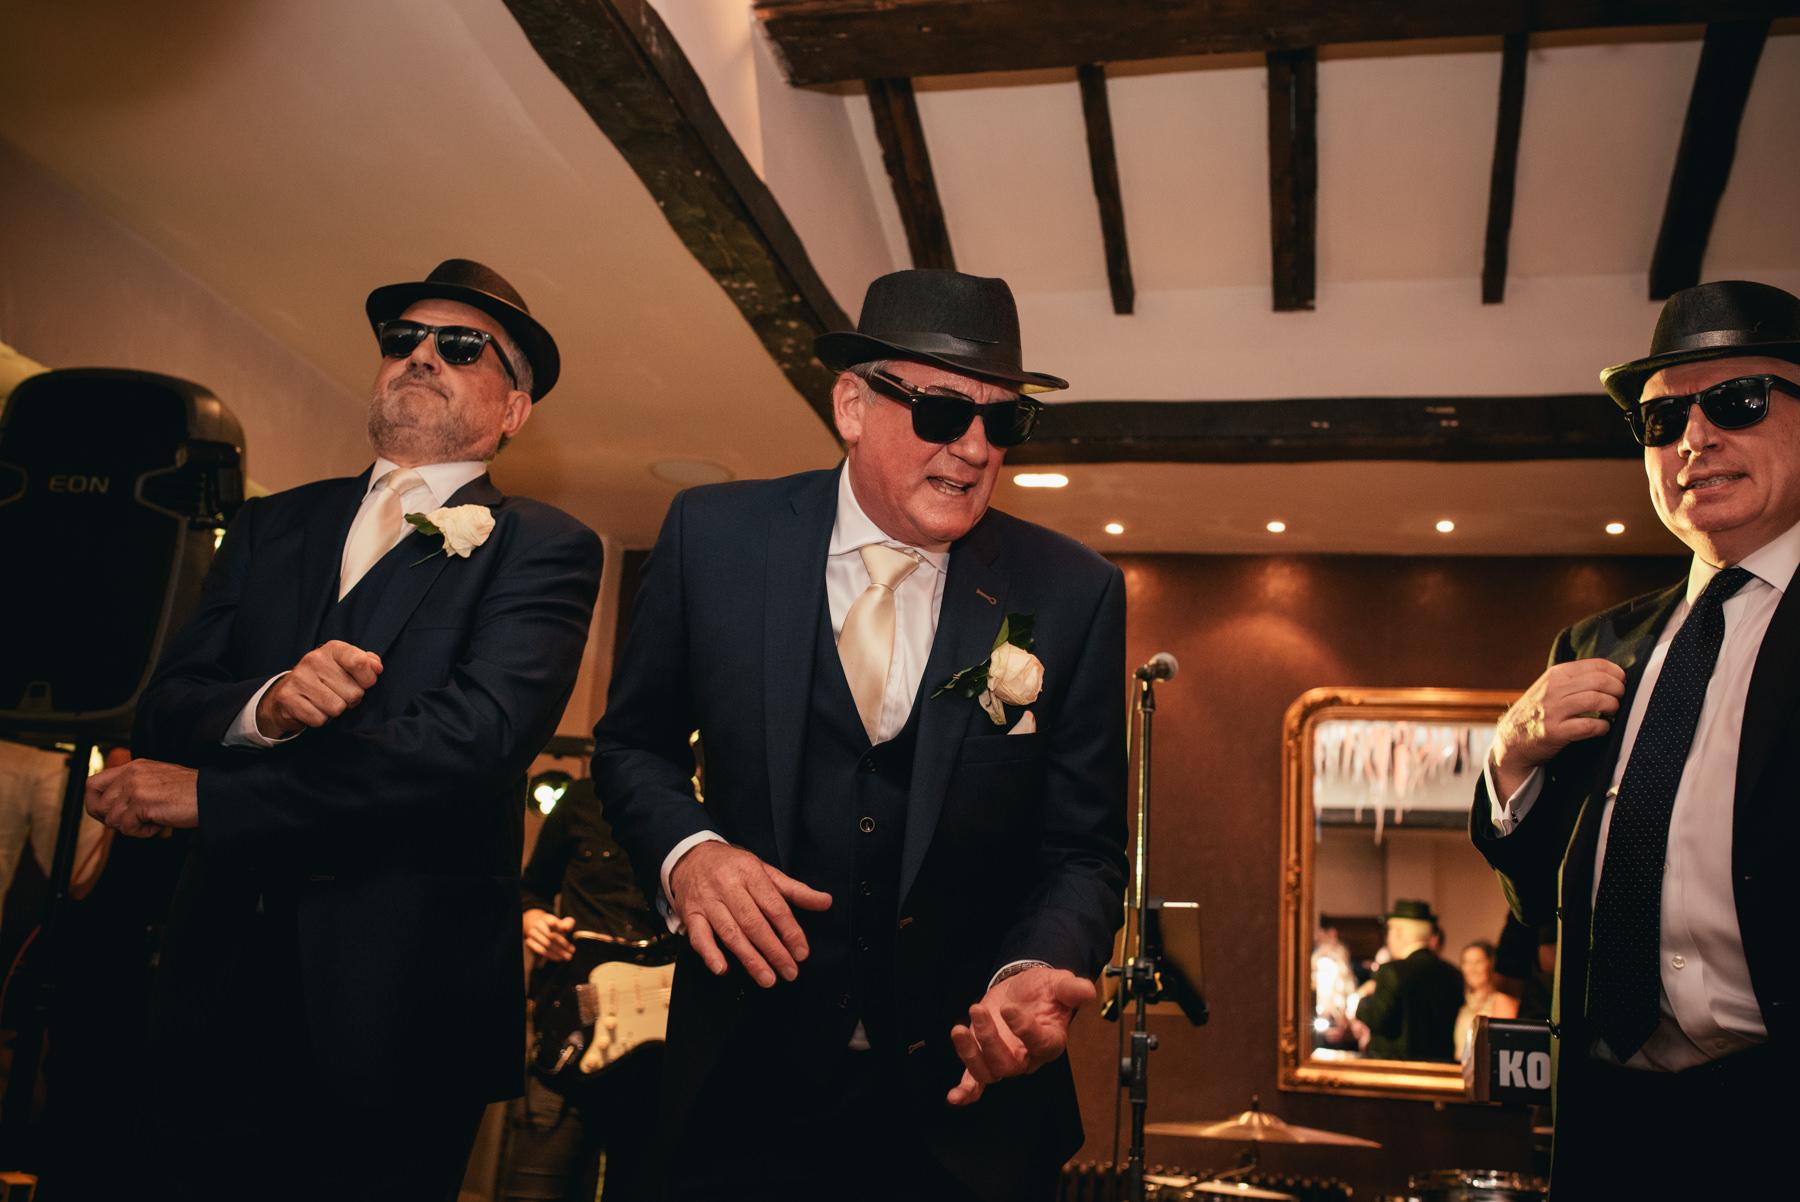 liverpool-wedding-photographer-72